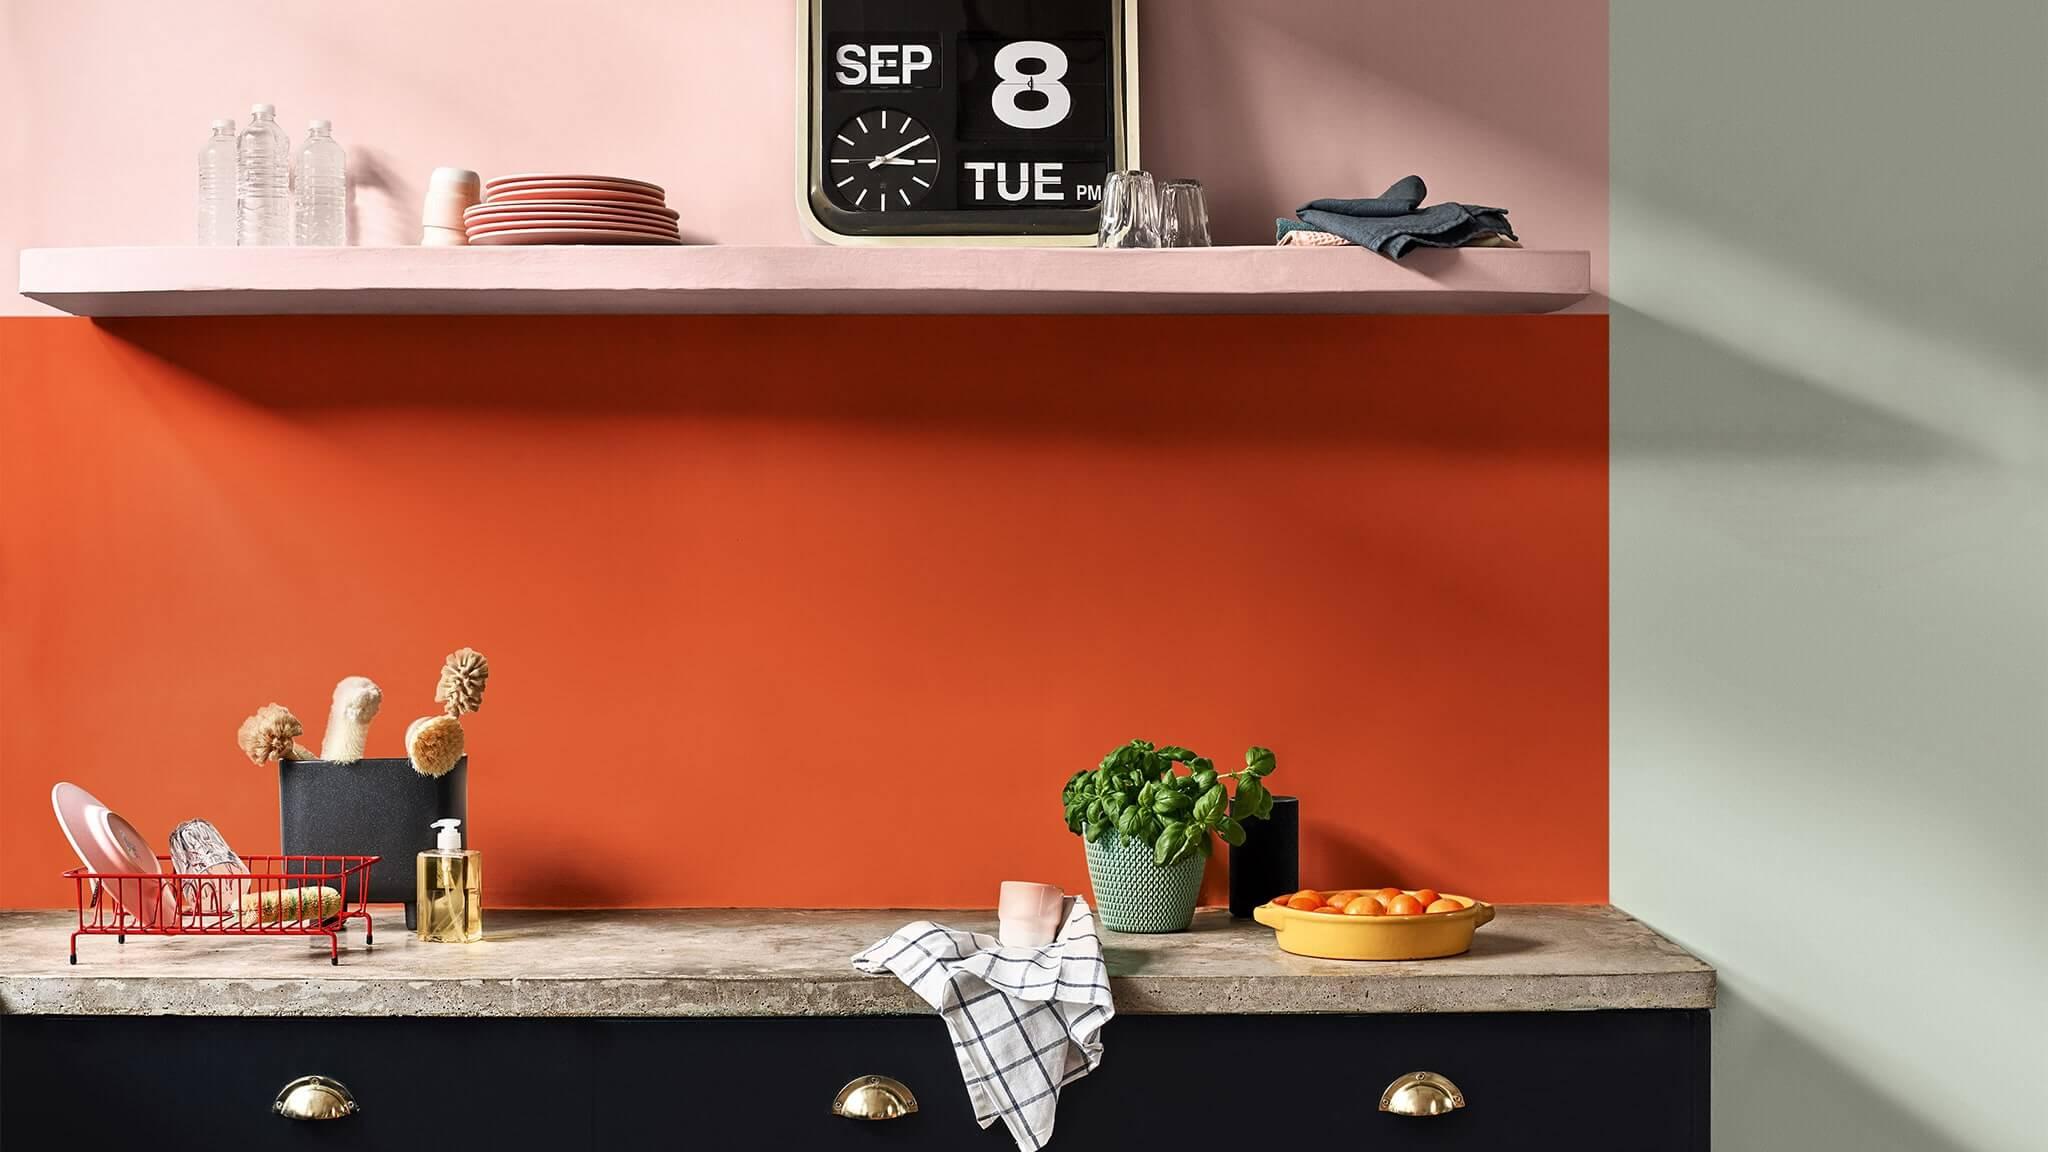 verf oranje keuken